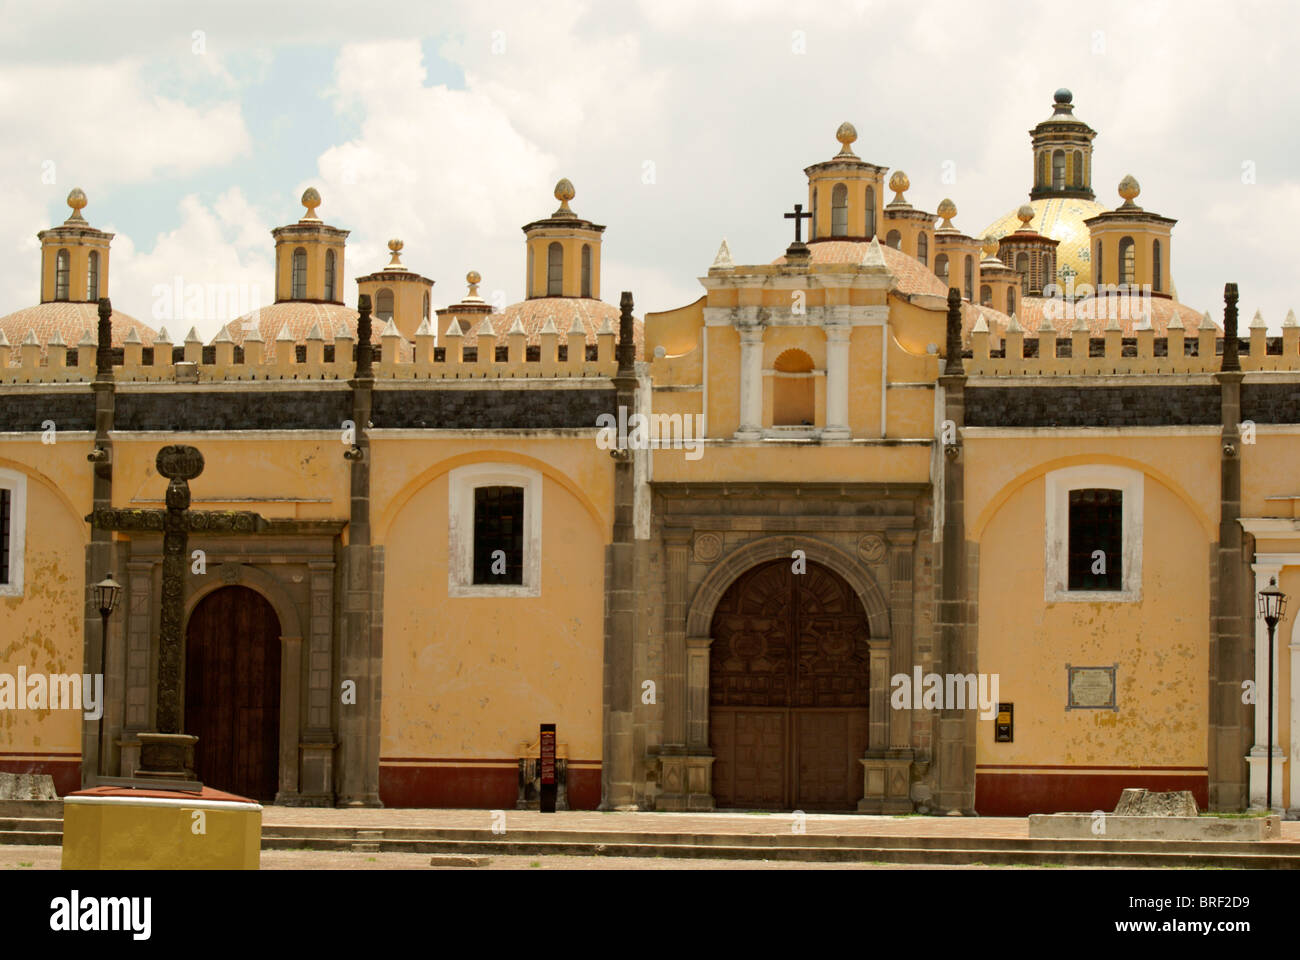 The 16th century Capilla Real, Ex-Convento de San Gabriel, Cholula, Puebla, Mexico. Cholula is a UNESCO World Heritage - Stock Image